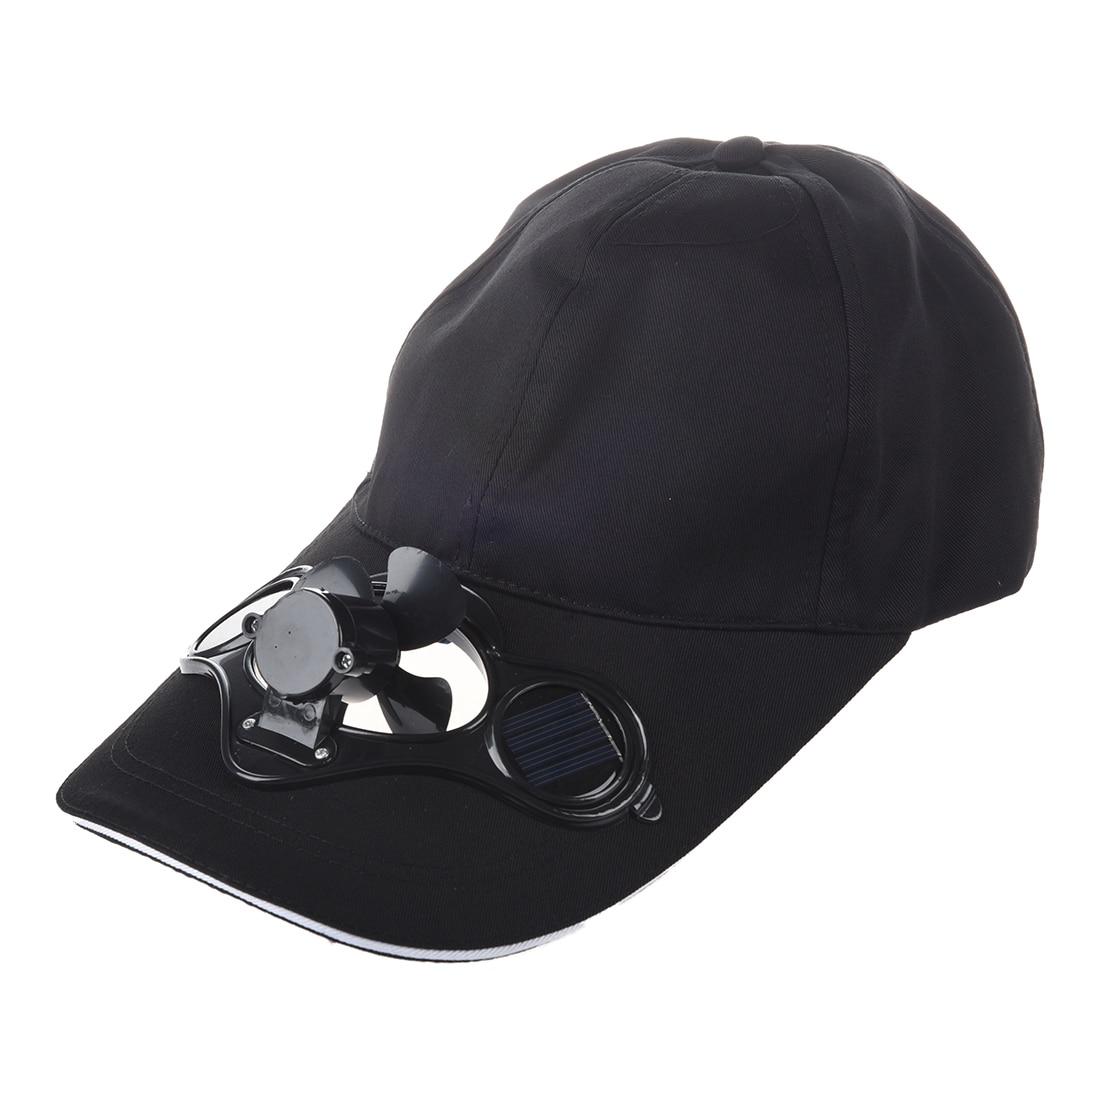 Frauen M nner Wrap Hip-Hop Turban Kapuze Stirnband Bandana Schals Hut BENE